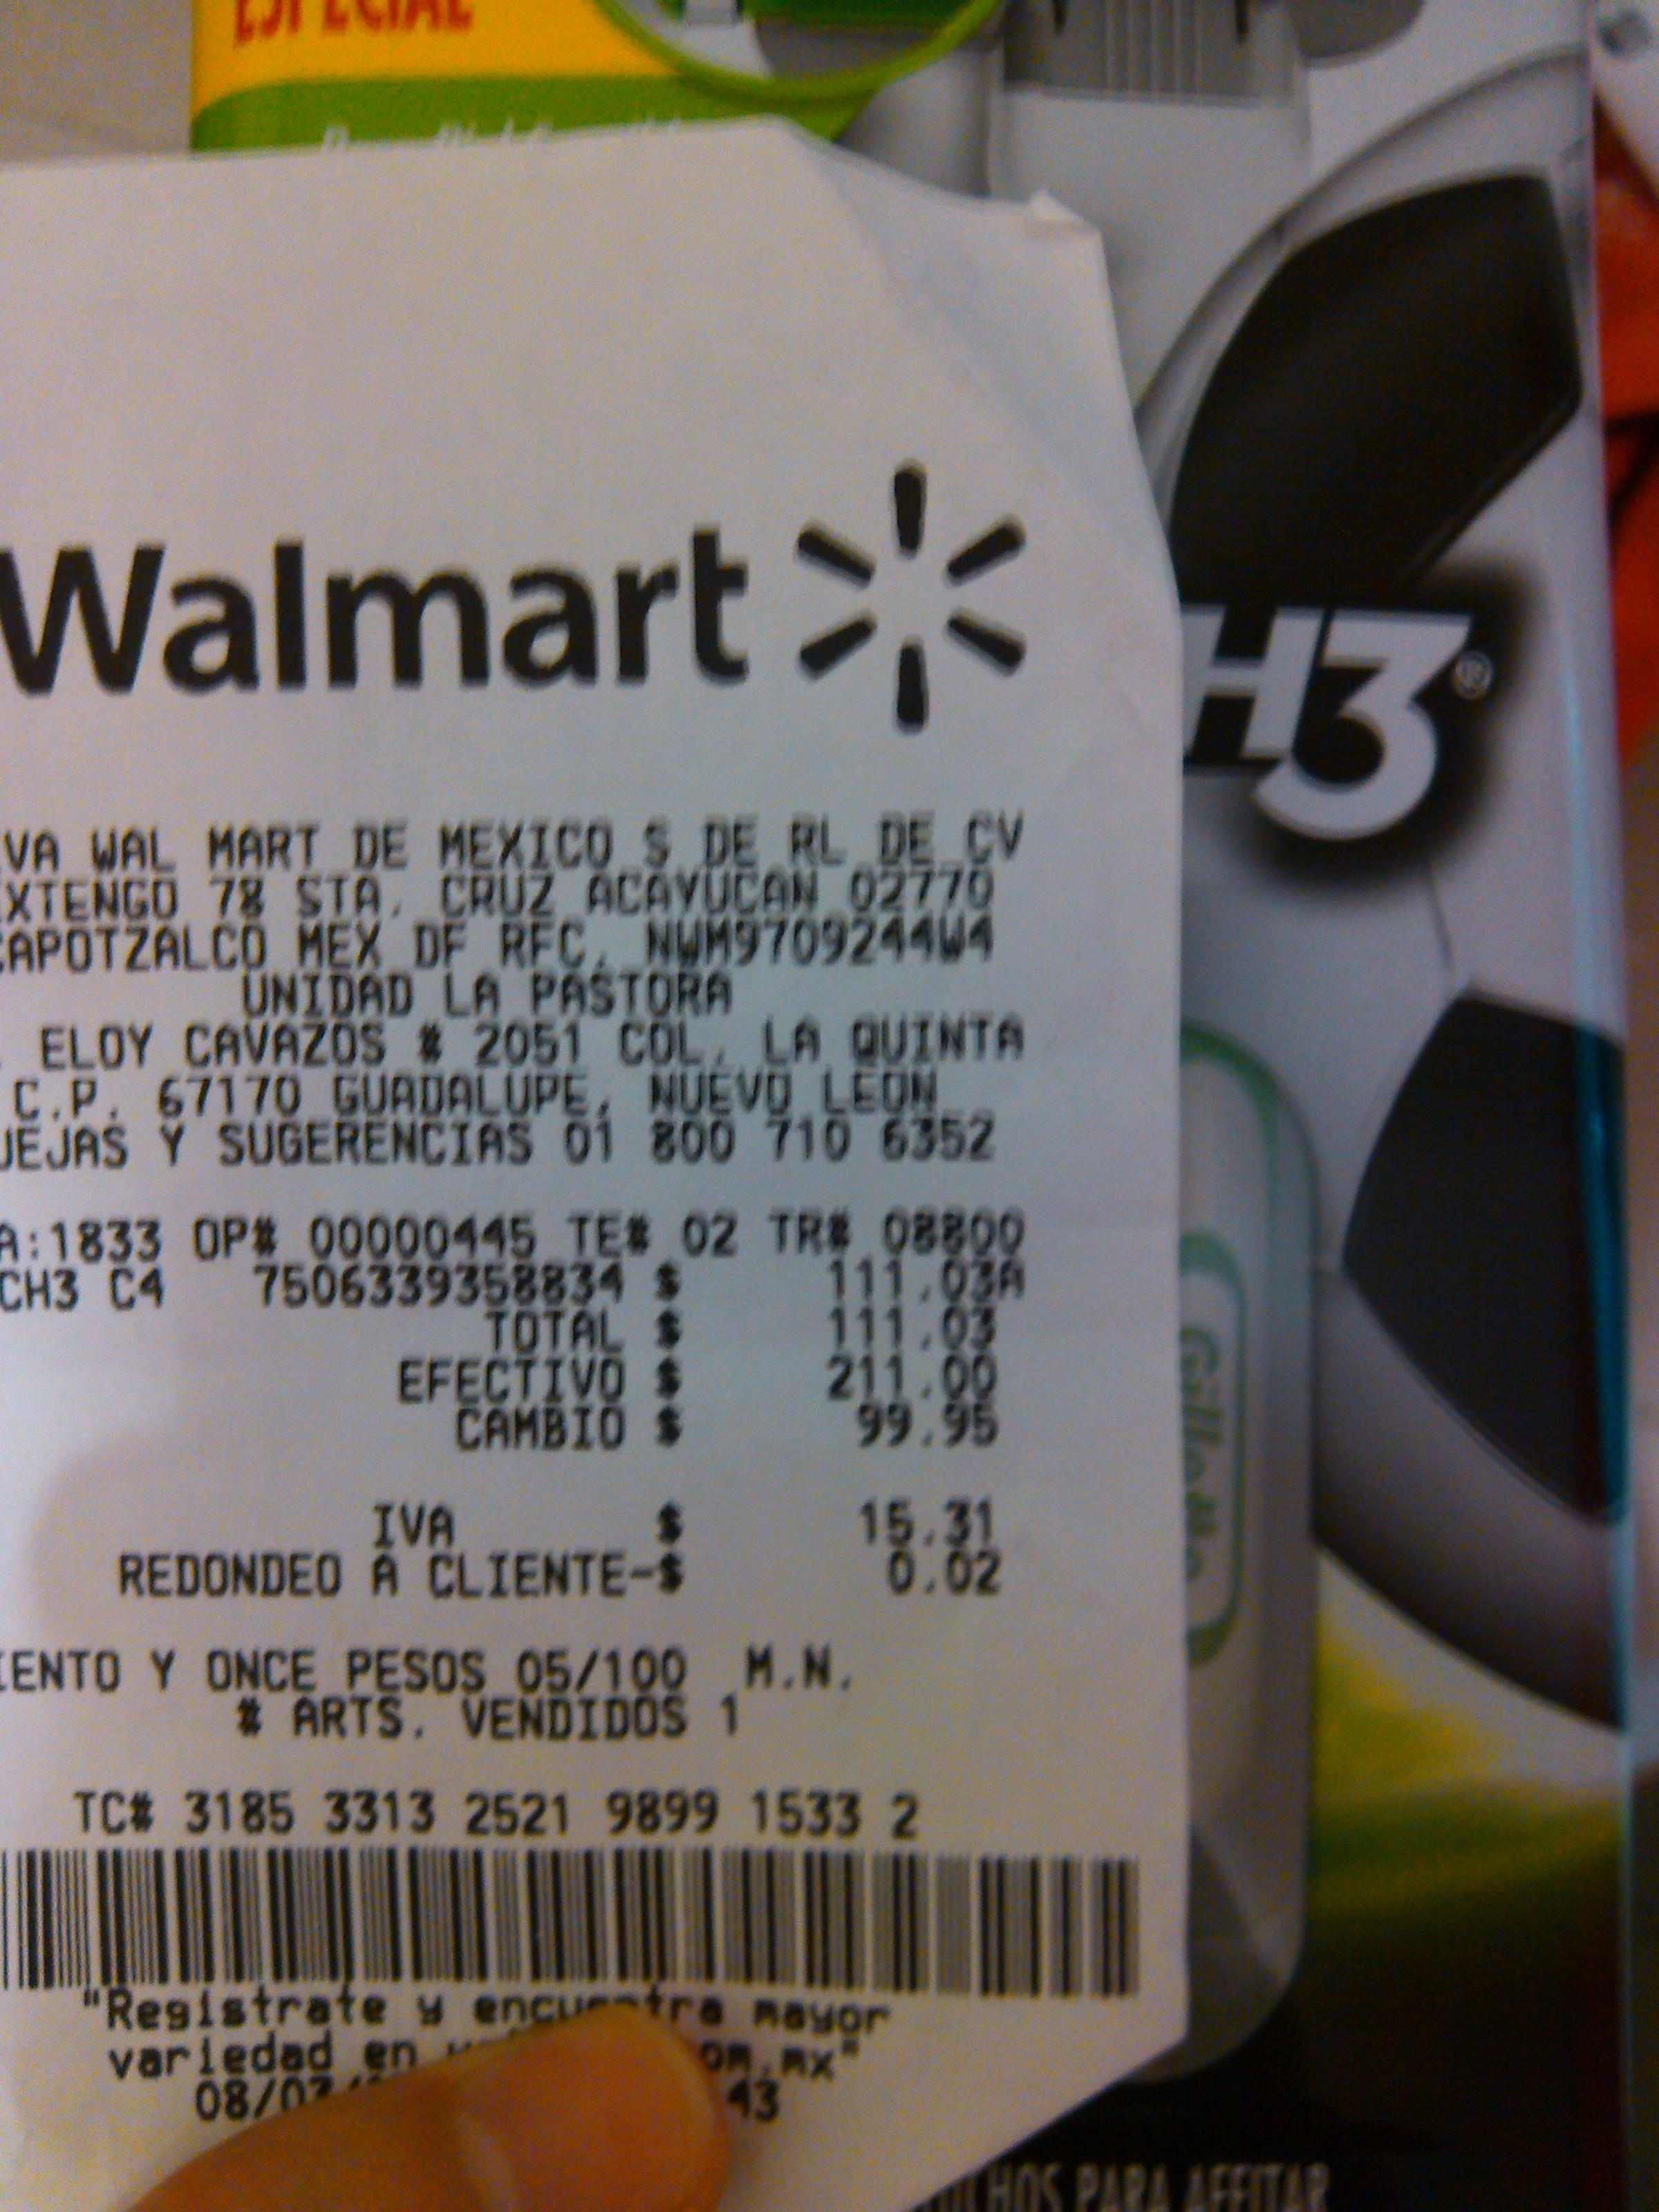 Walmart: Paquete Gillette Mach3 sensitive 5 cartuchos $111.03